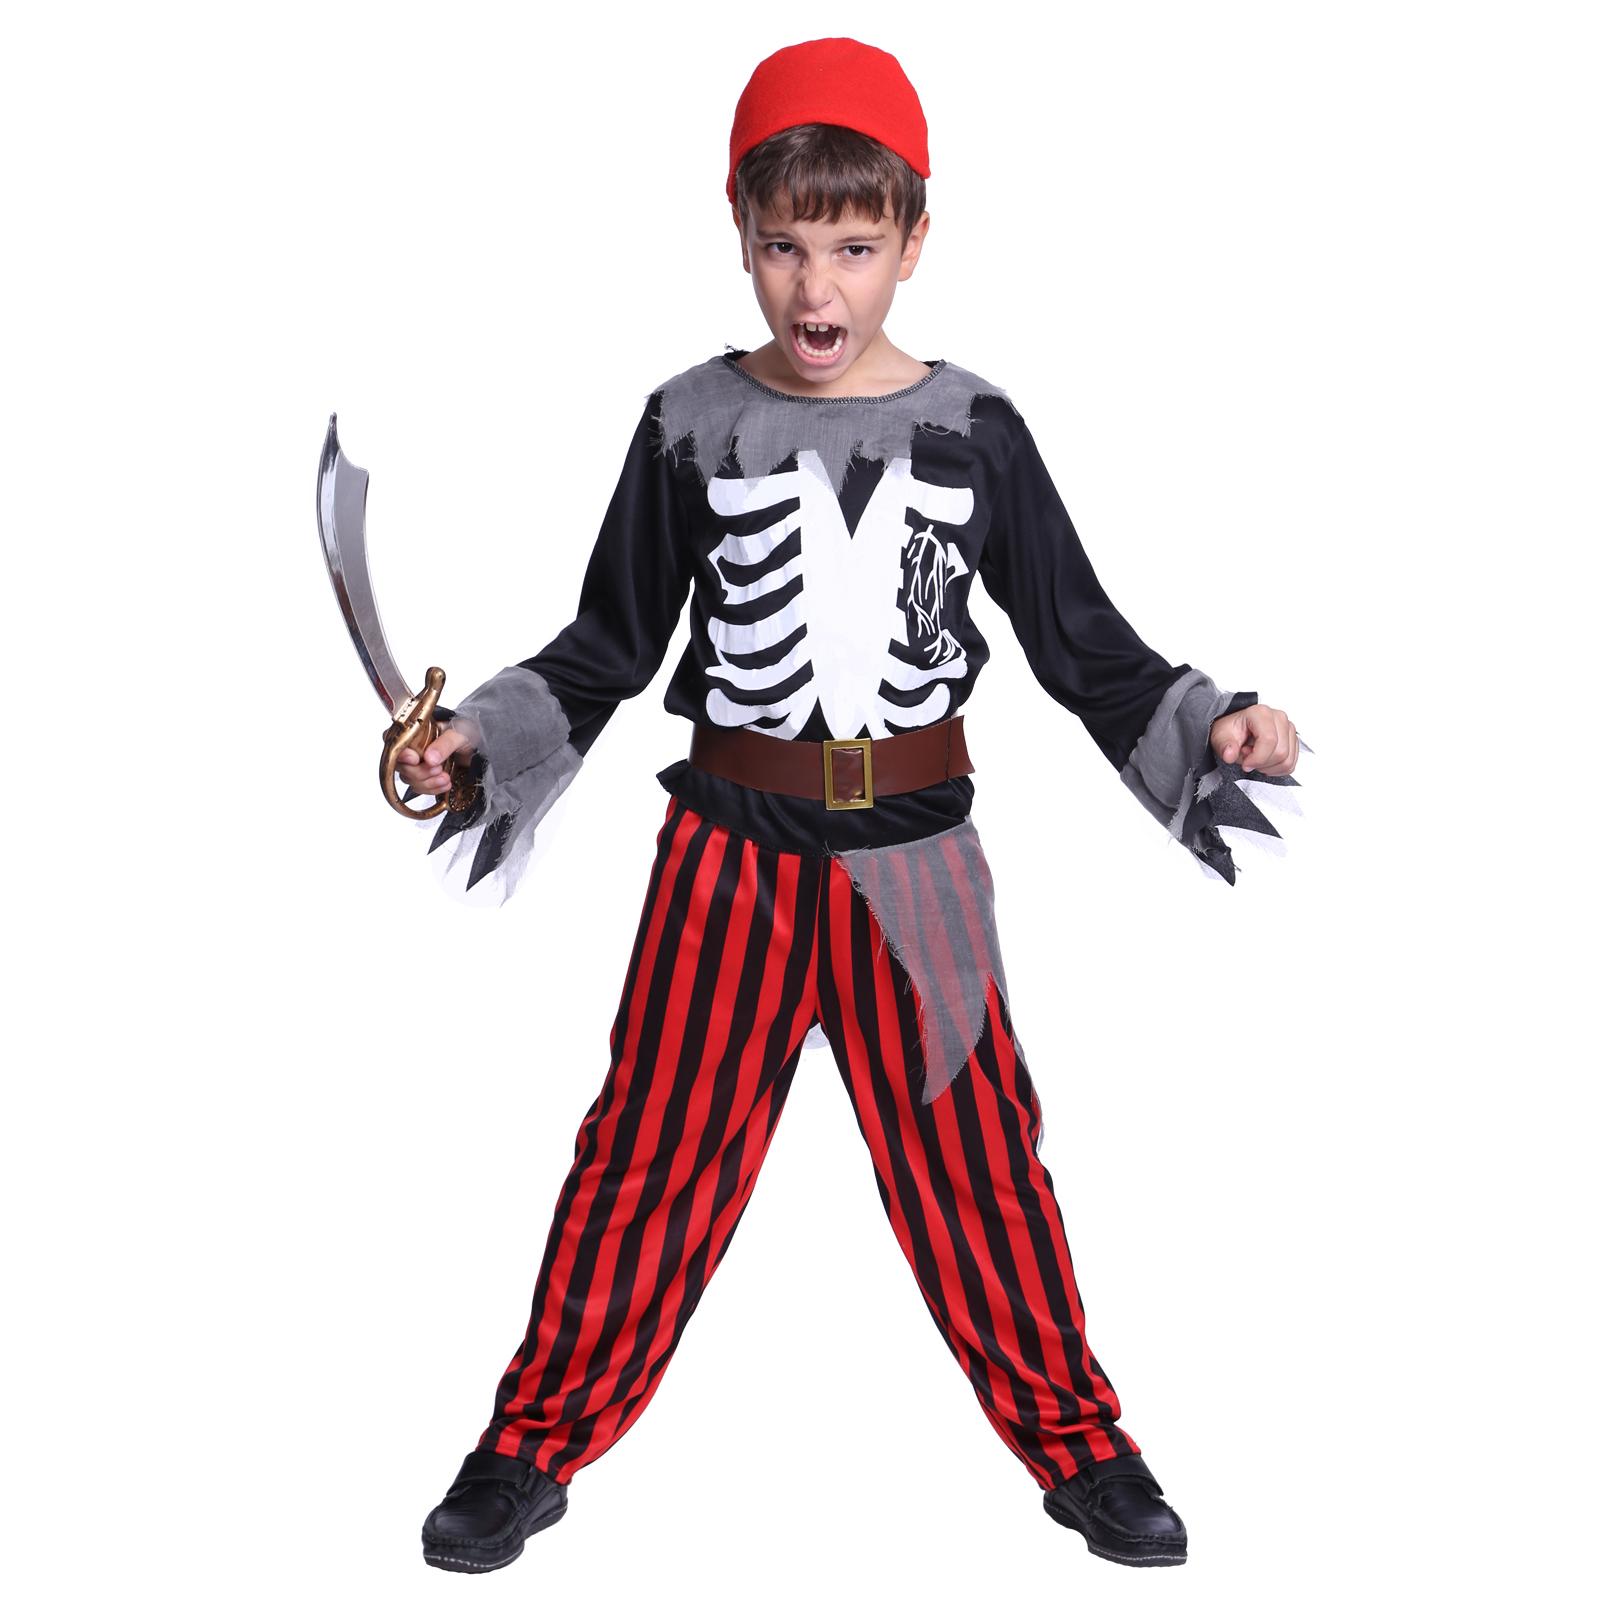 childs kids halloween costume boys girls pirate zombie fancy dress